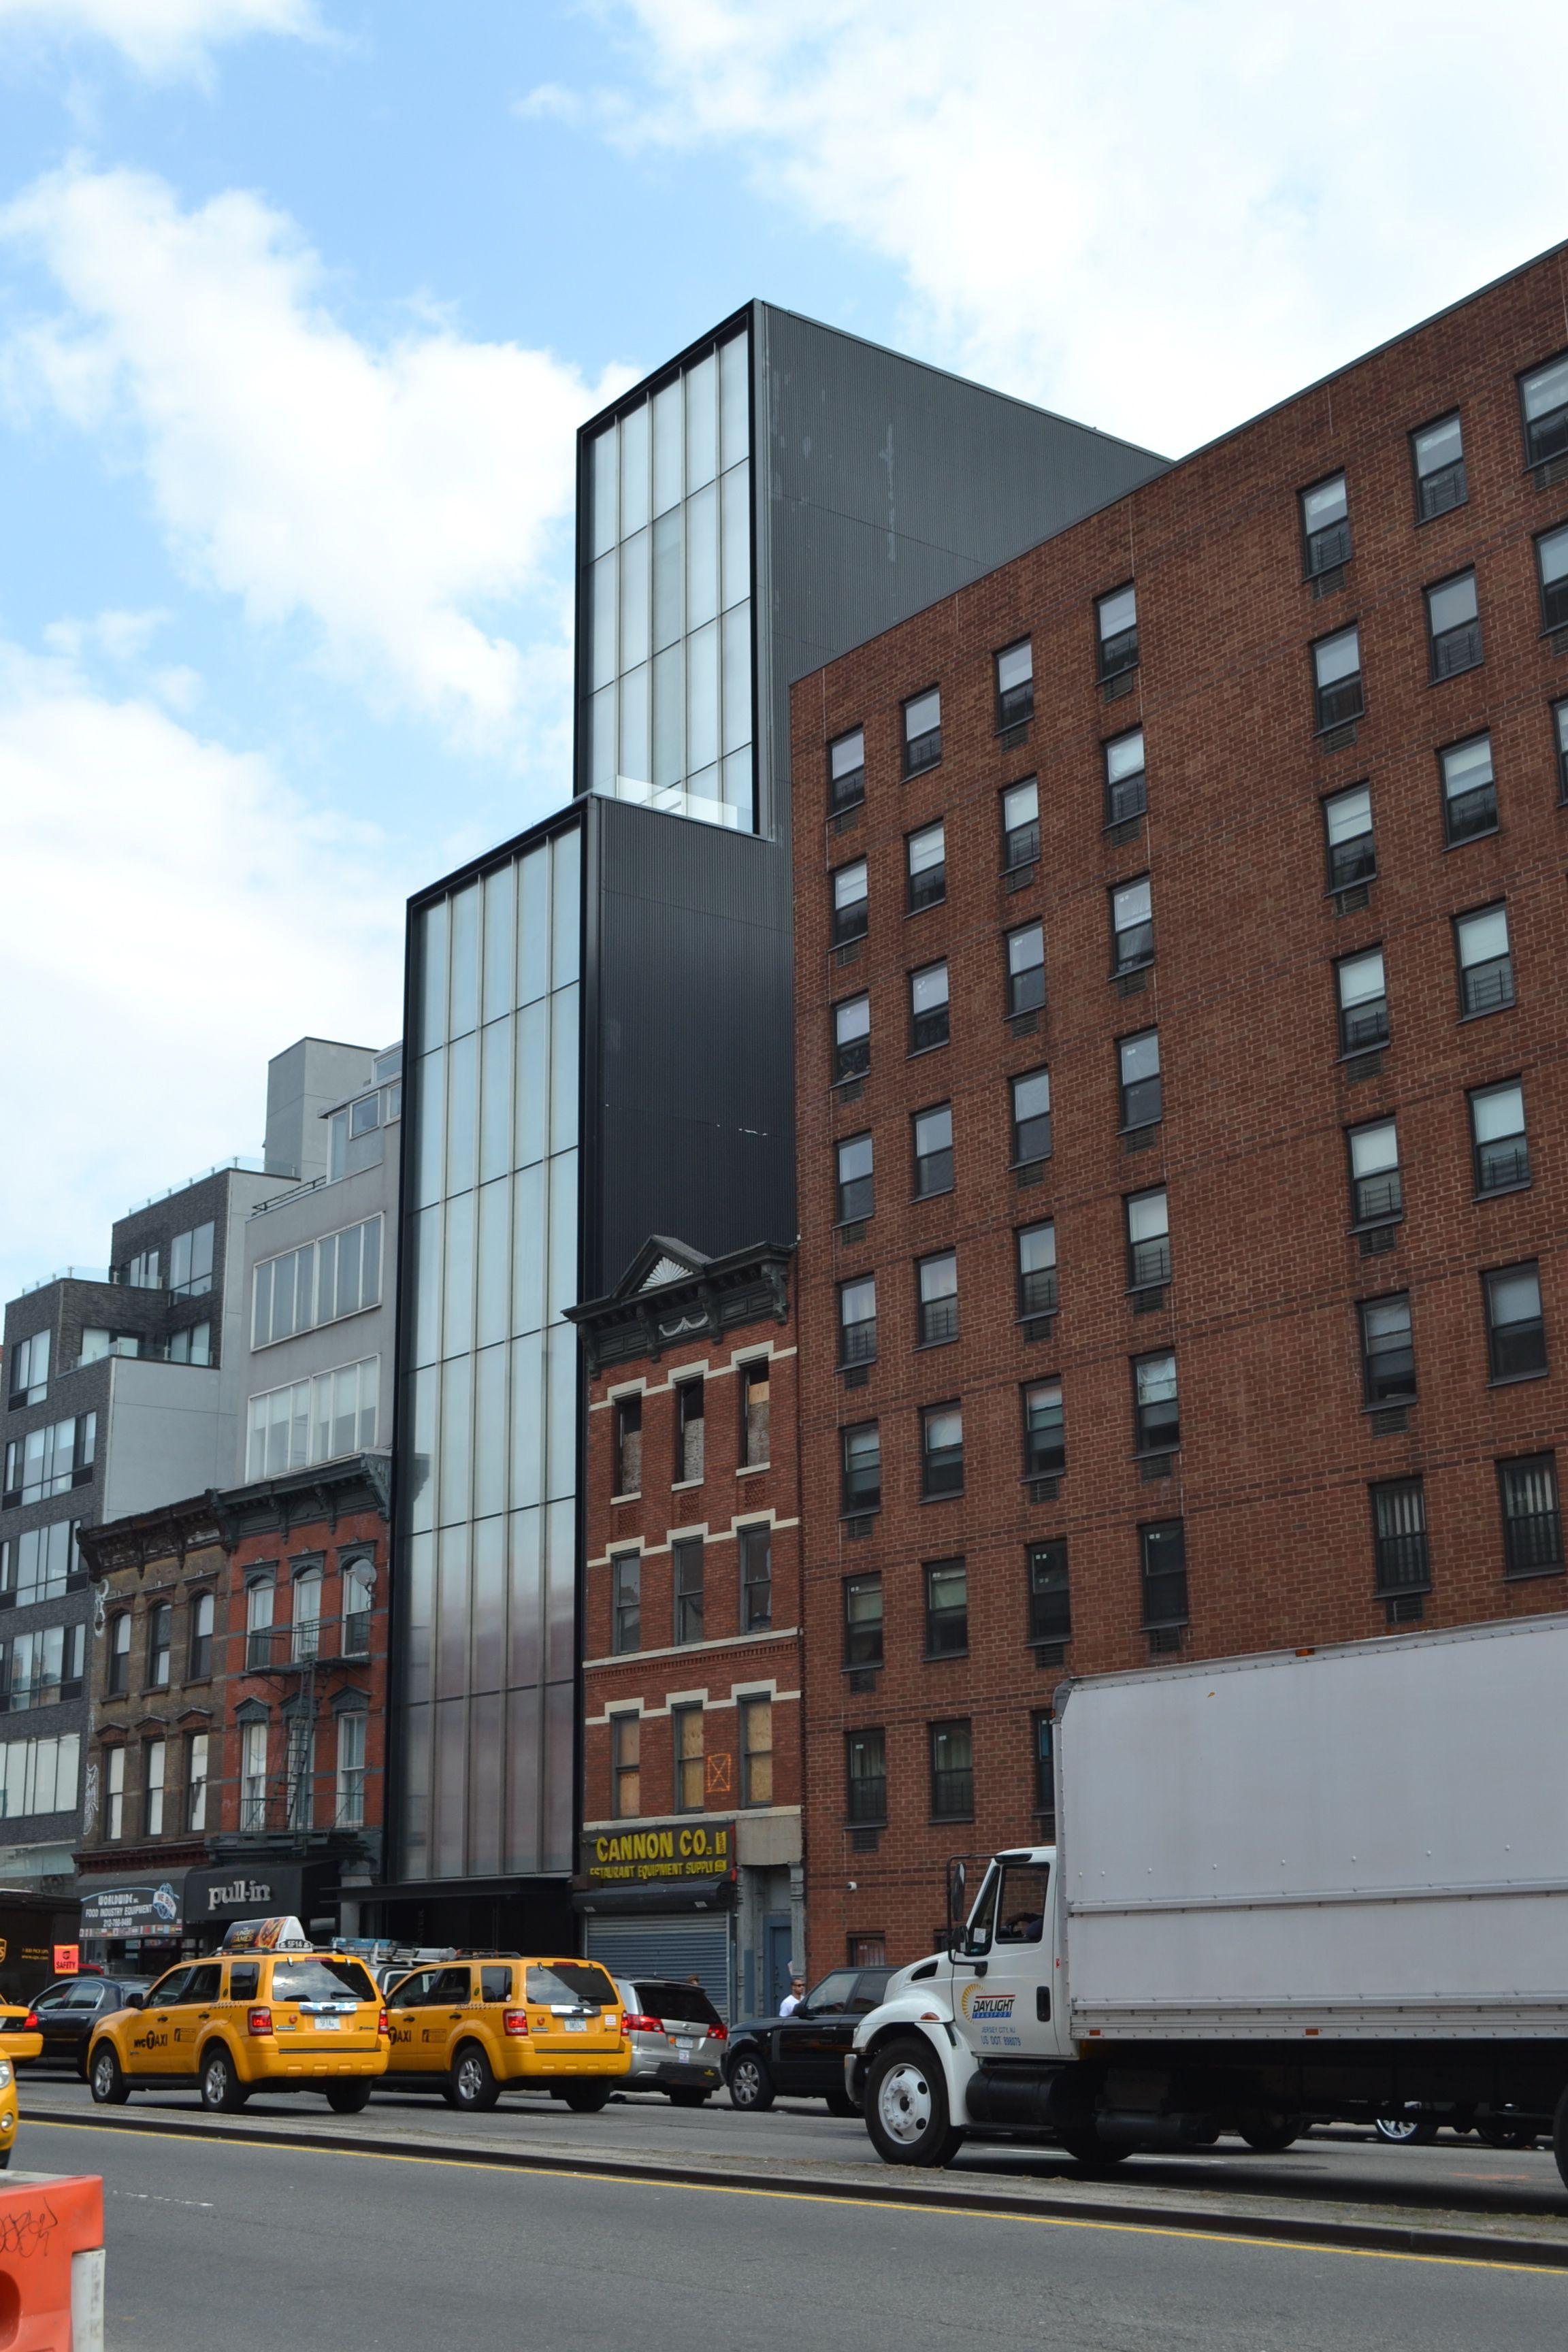 norman foster's sperone westwater gallery in new york